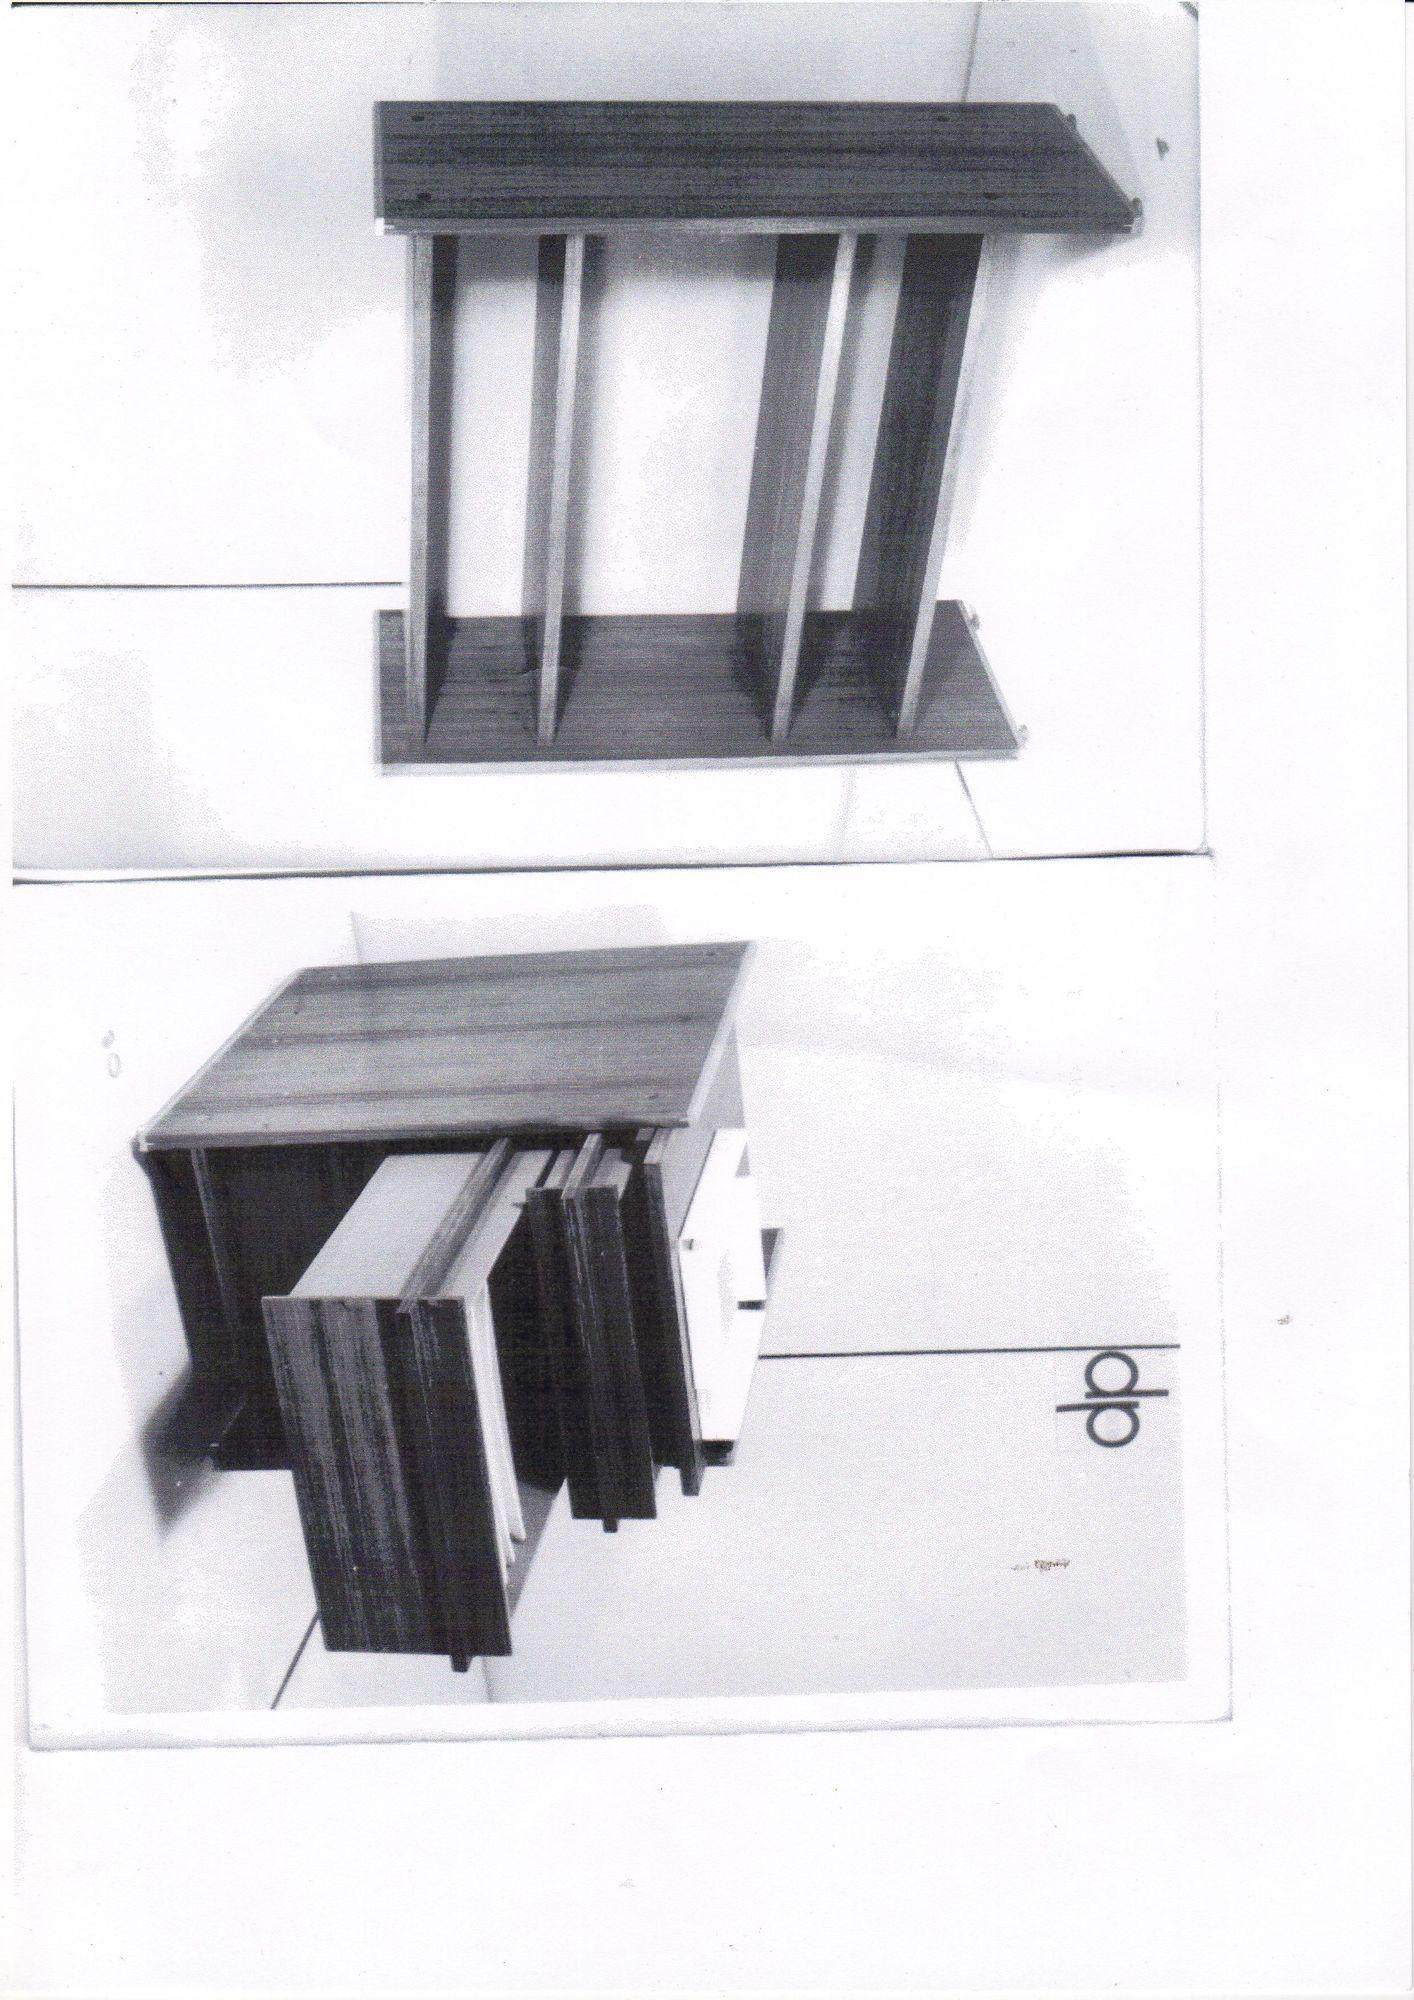 Decoplan meubelen De Coene 04